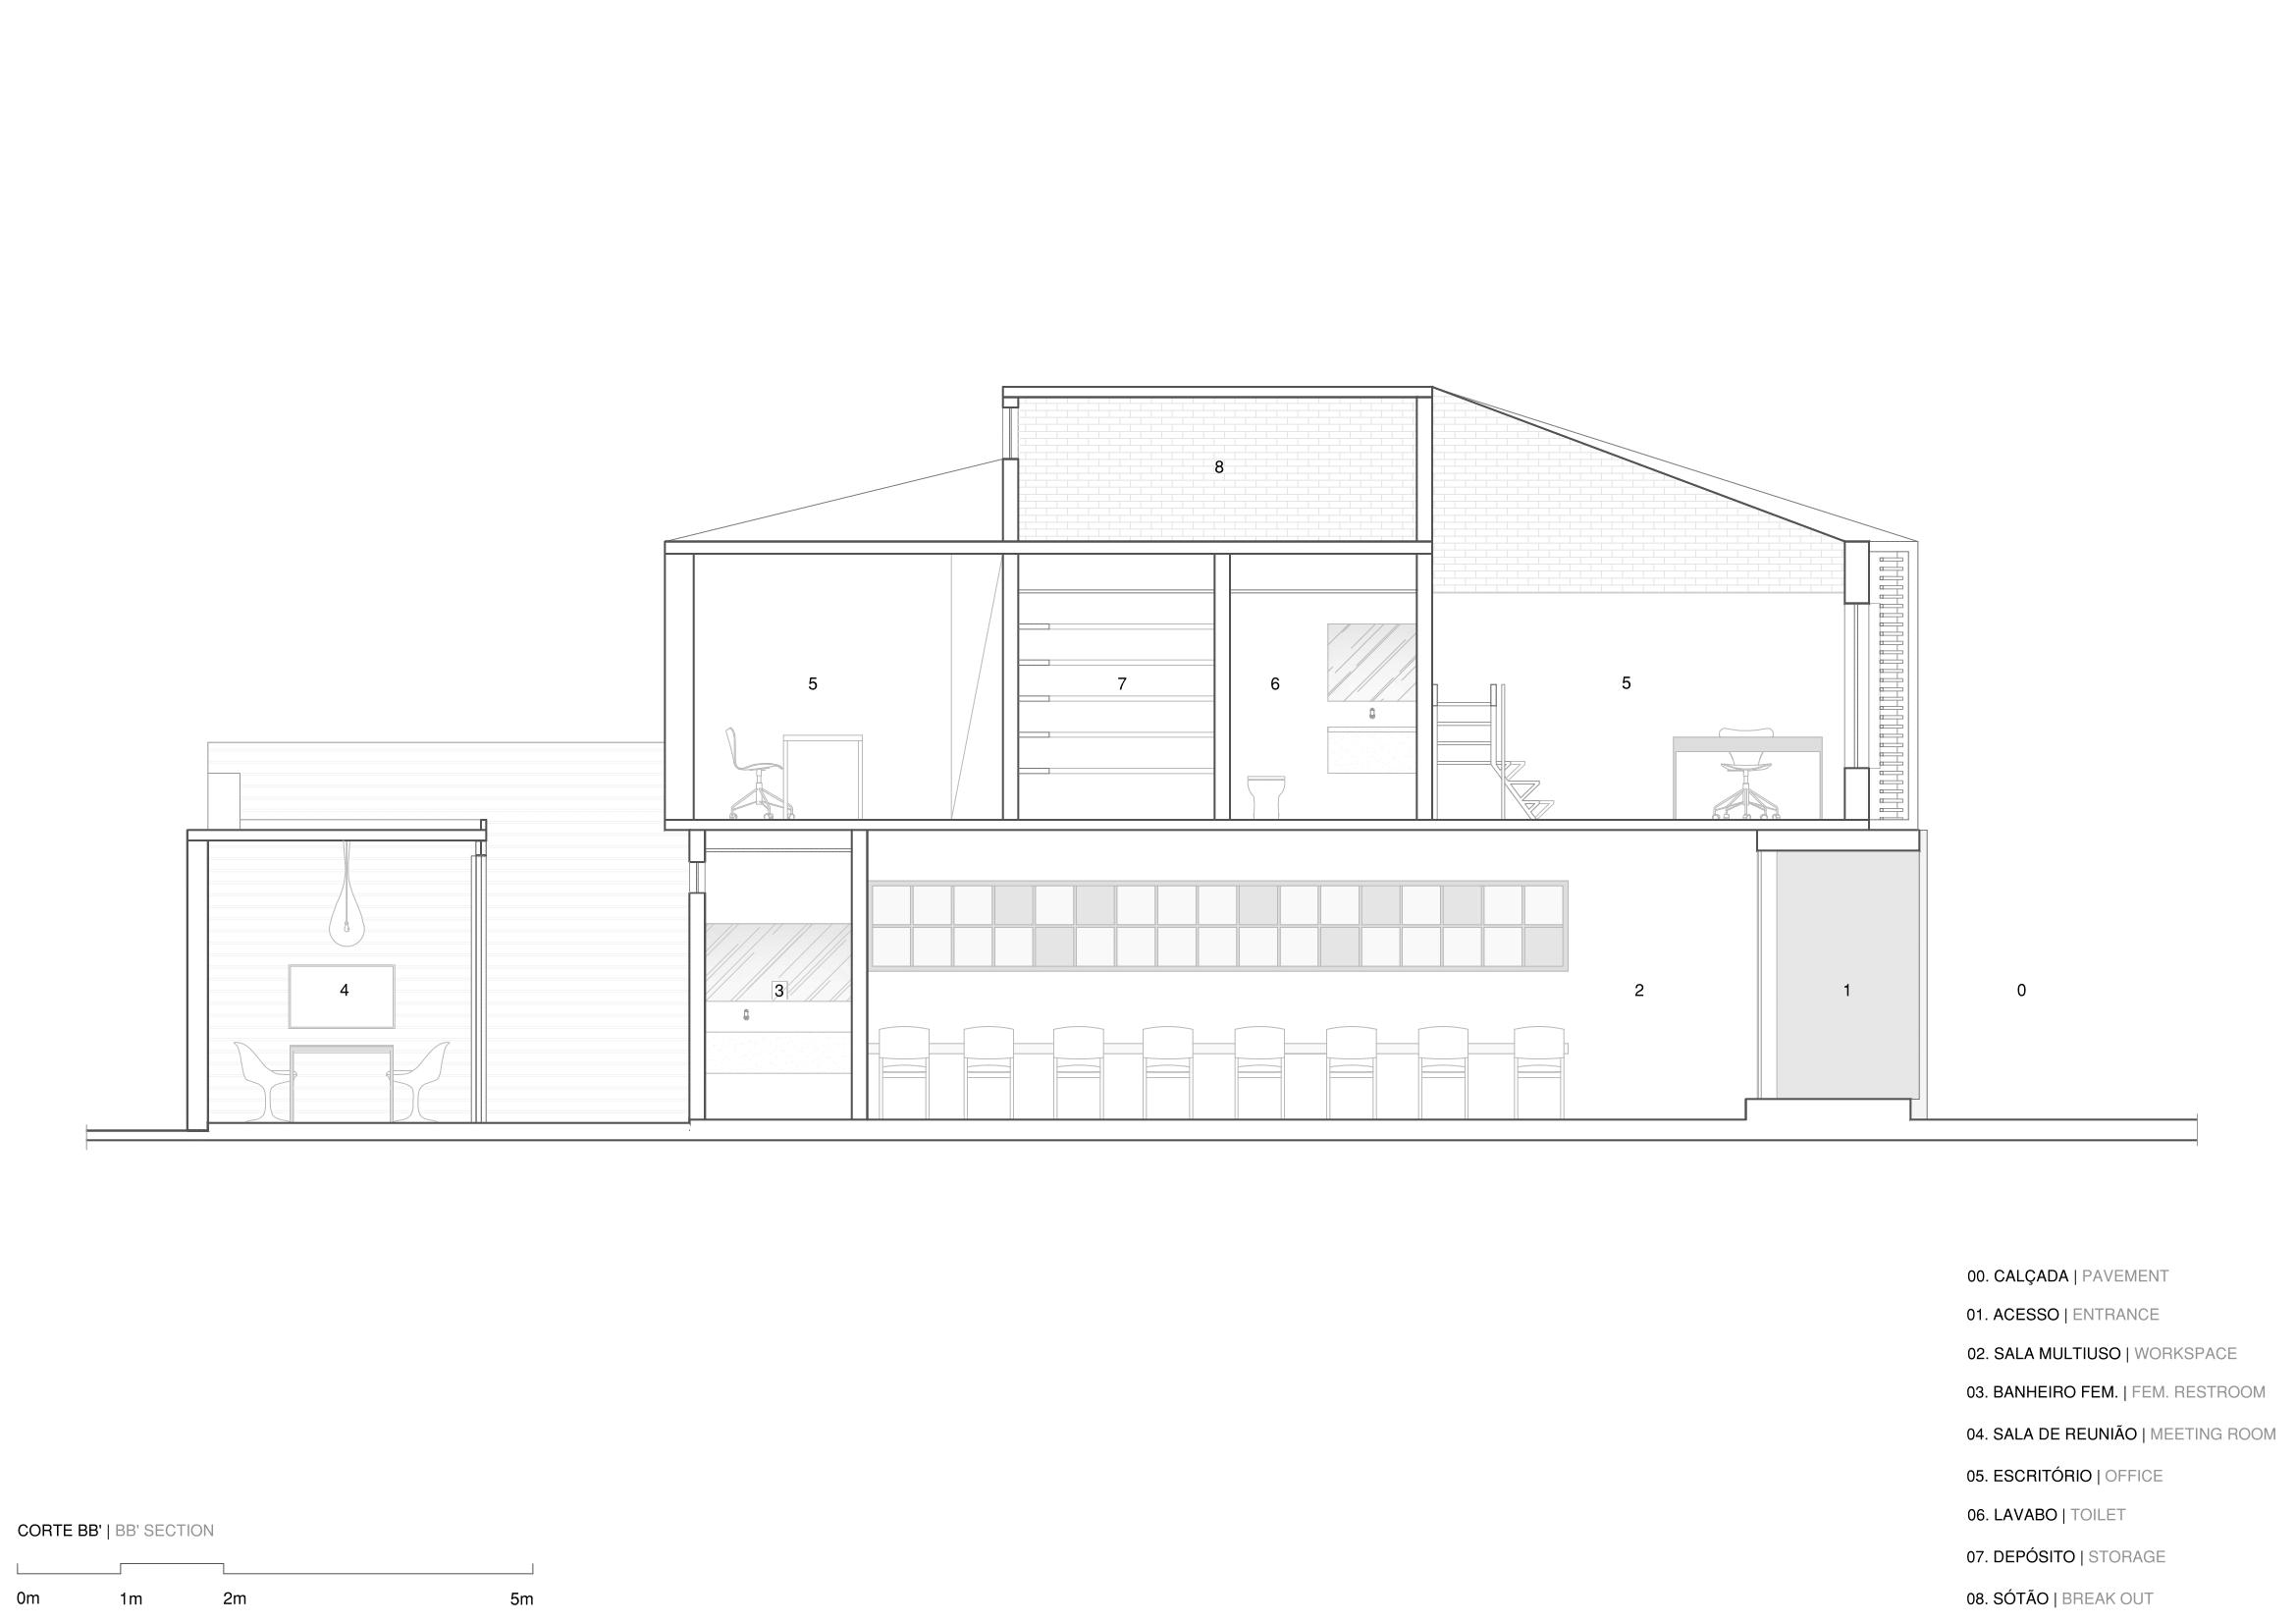 hobjeto-arquitetura-produtora-velloni-ap-05-cortebb